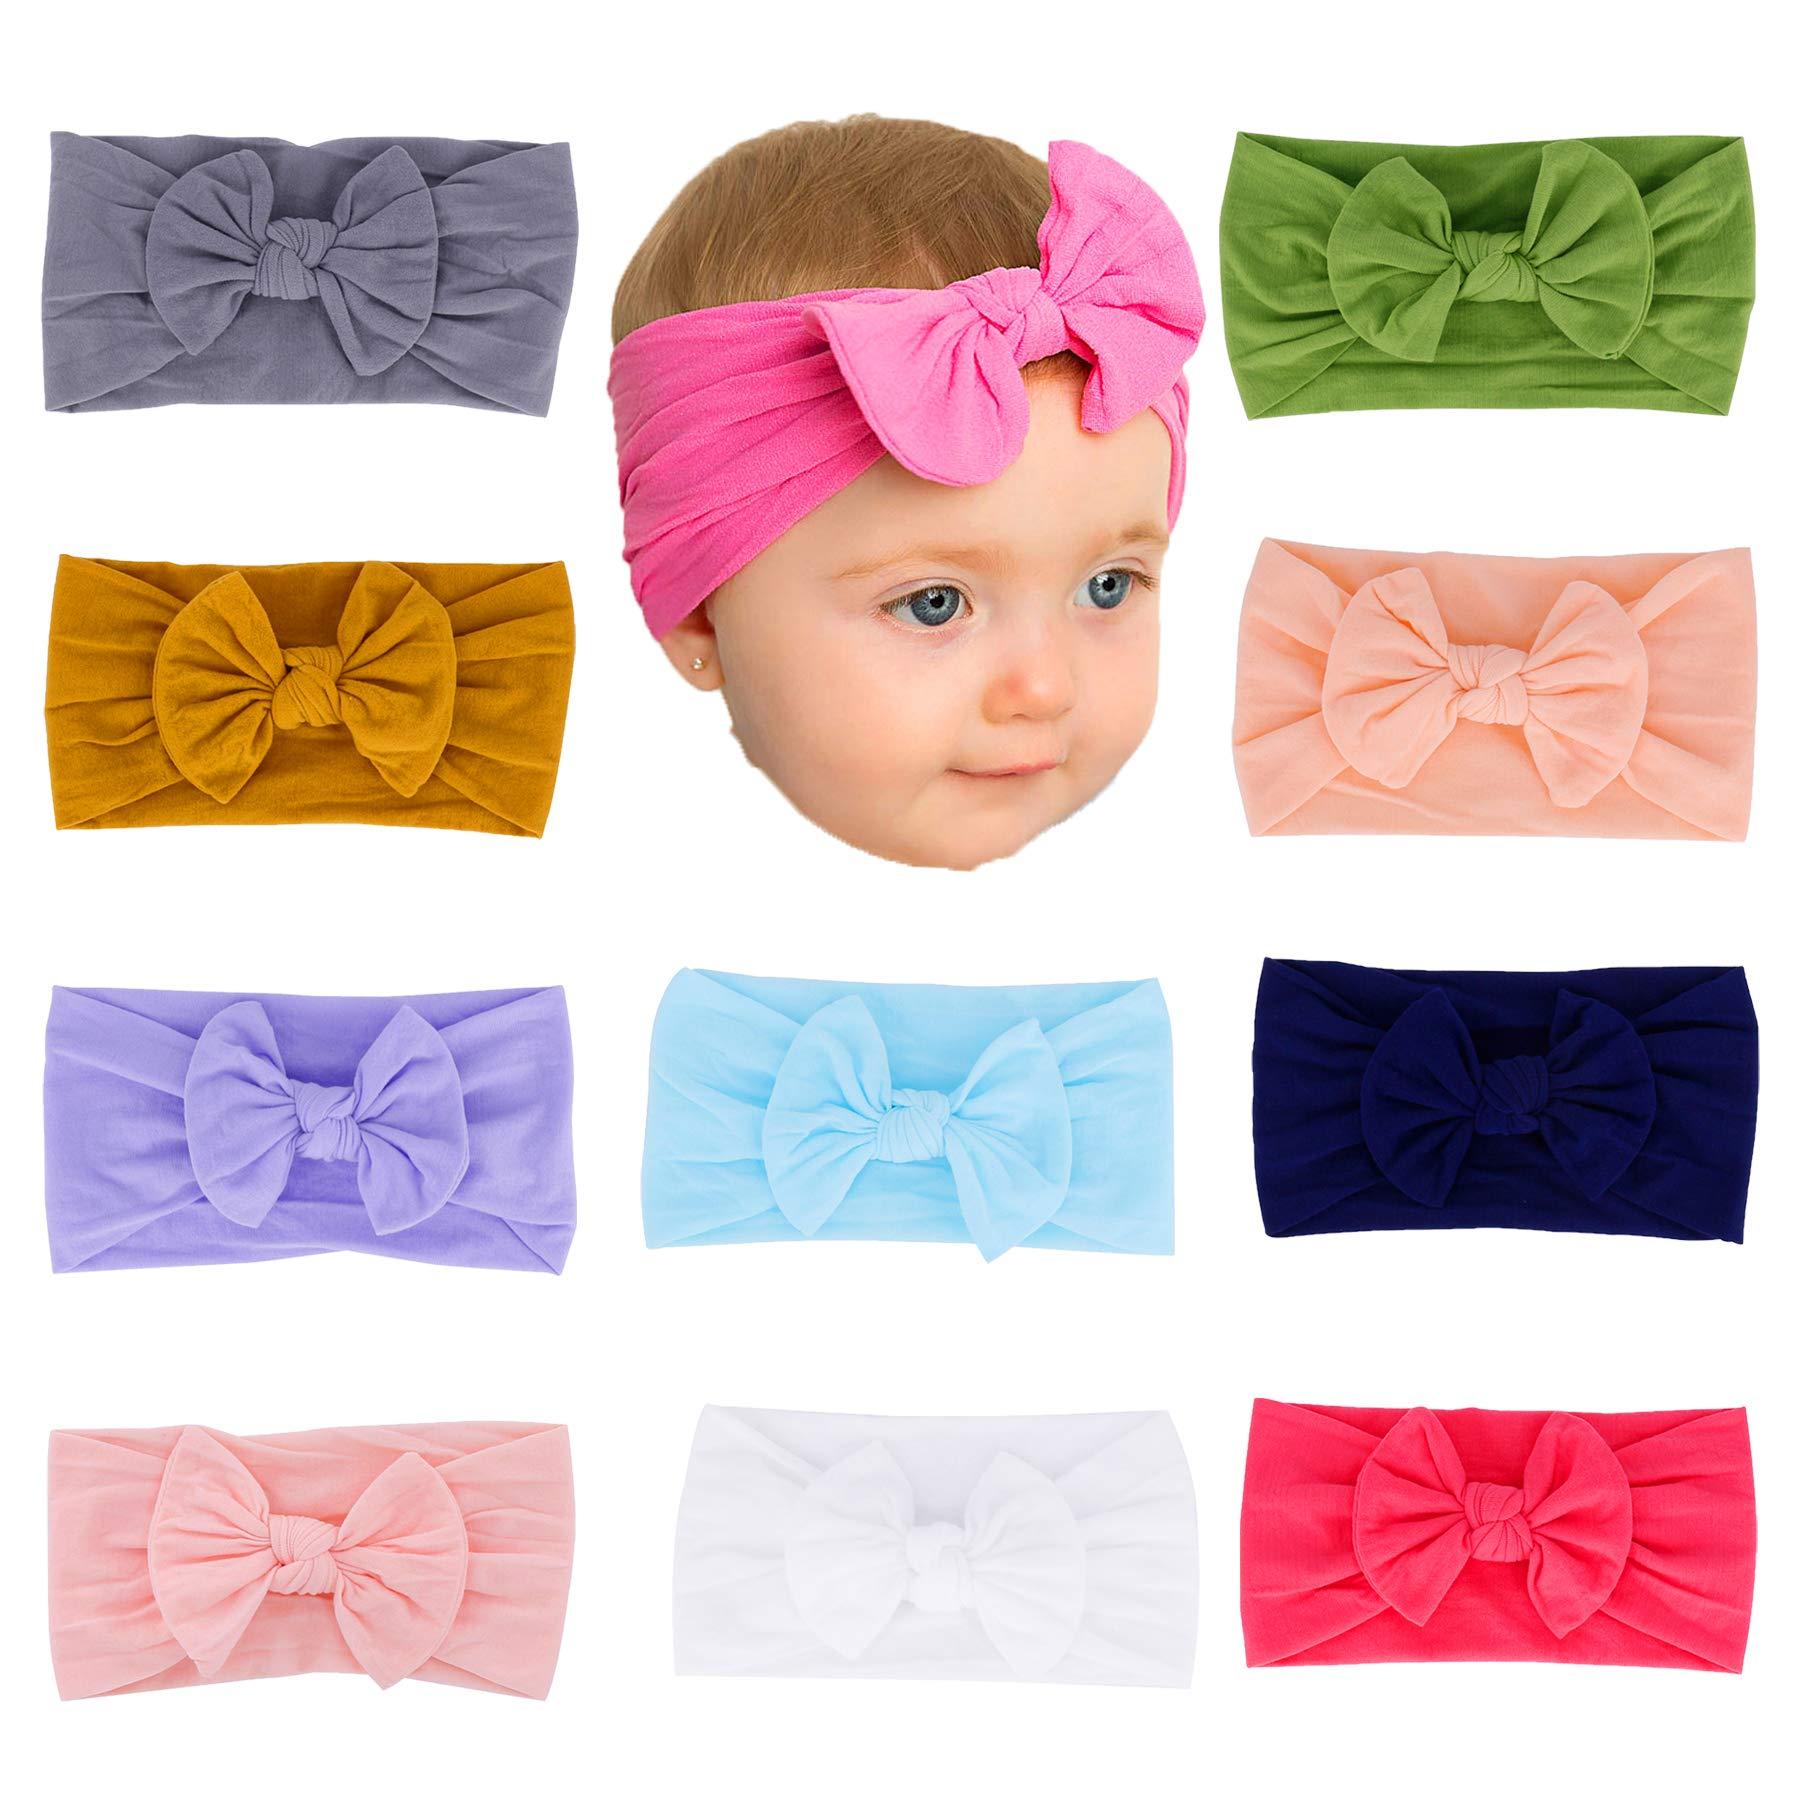 Baby Girl Nylon Headbands Newborn Infant Toddler Turban Hairbands Bows Child bandana Headwrap Hair Accessories (Multicolor Set6-10 Pcs)